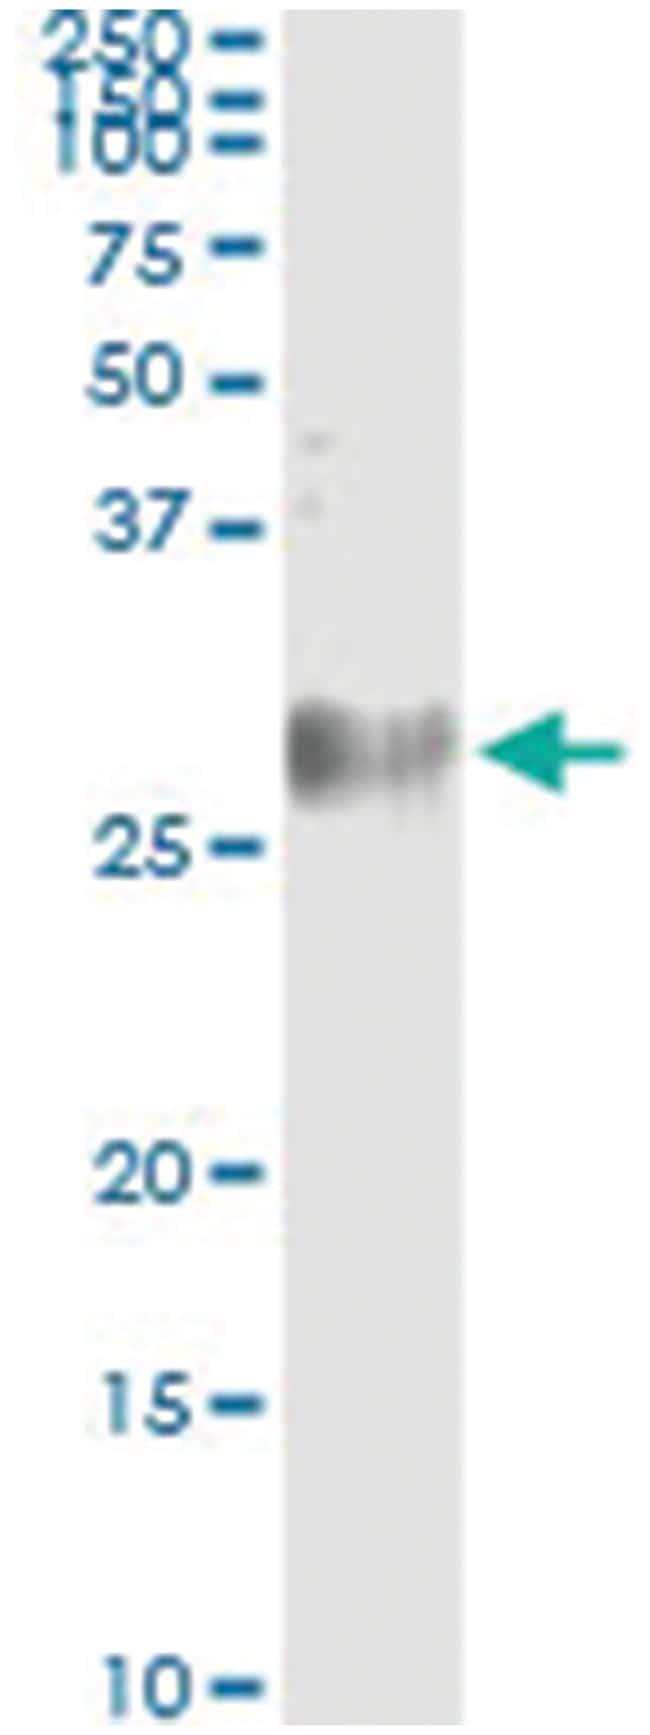 MREG, Human, IP-WB Antibody Pair (PW2), Abnova 1 Set:Life Sciences